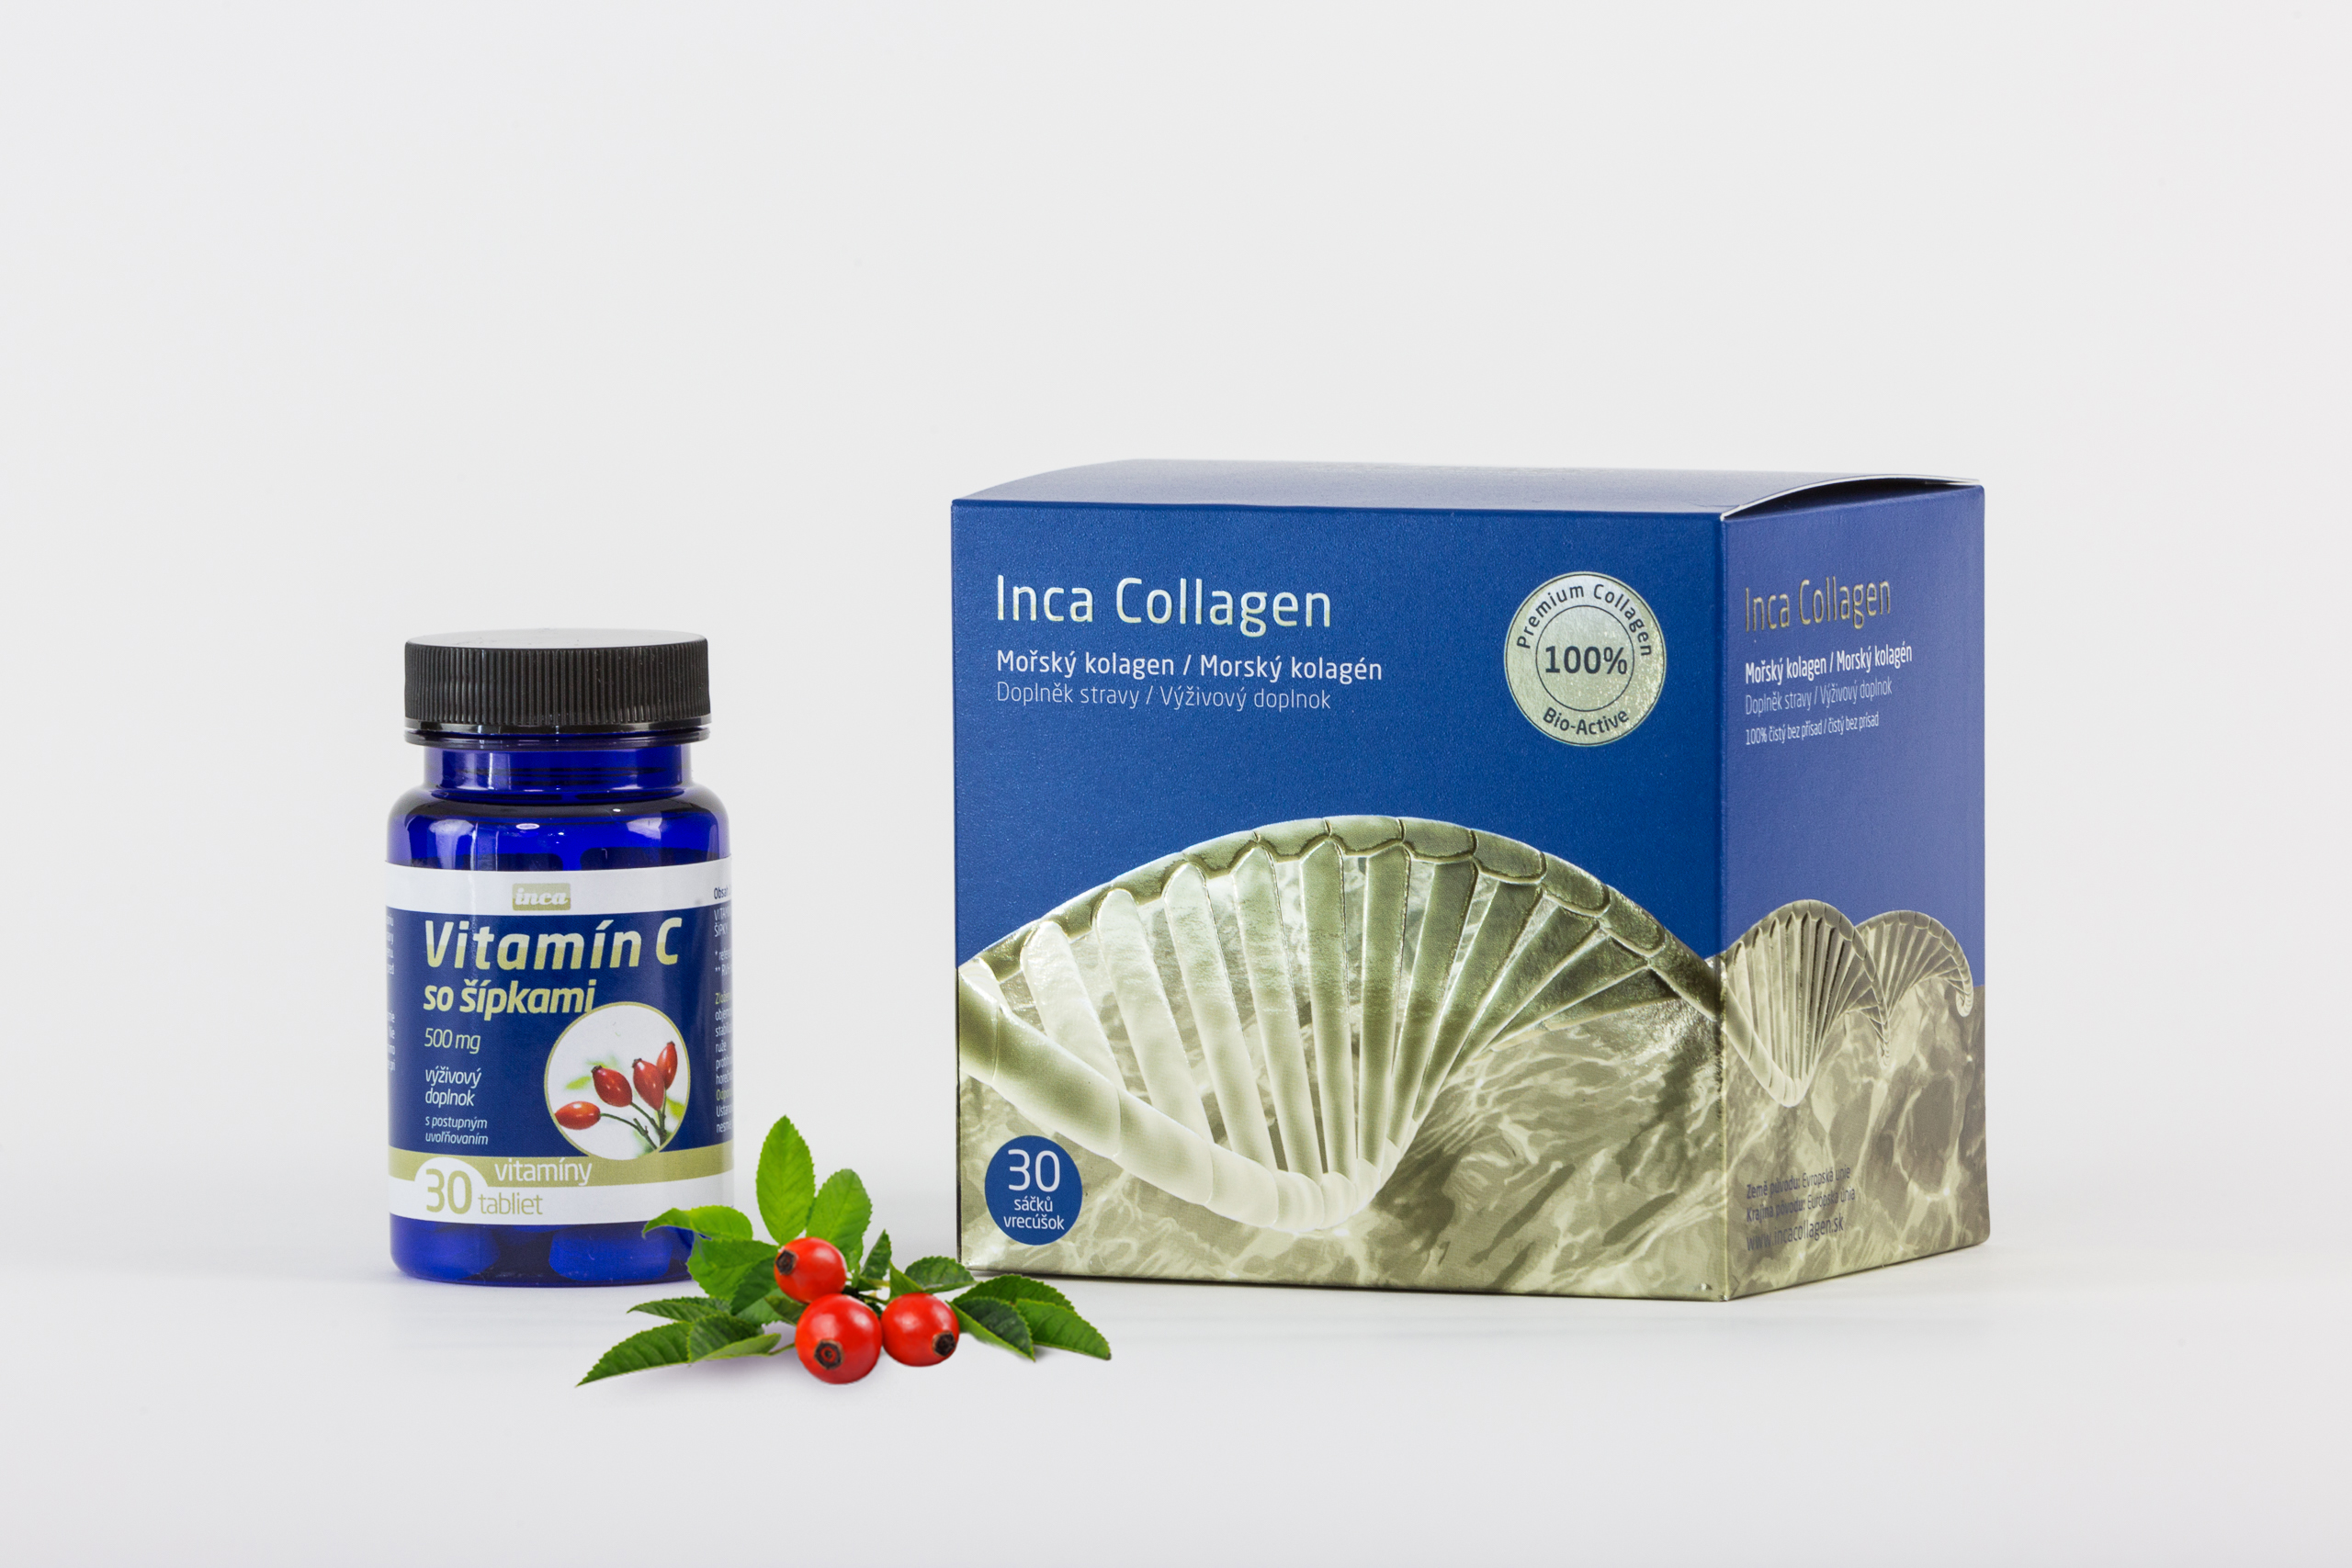 3256fcea846d Inca Collagen - Morský kolagén 100% čistý bez prísad - BIO a ...